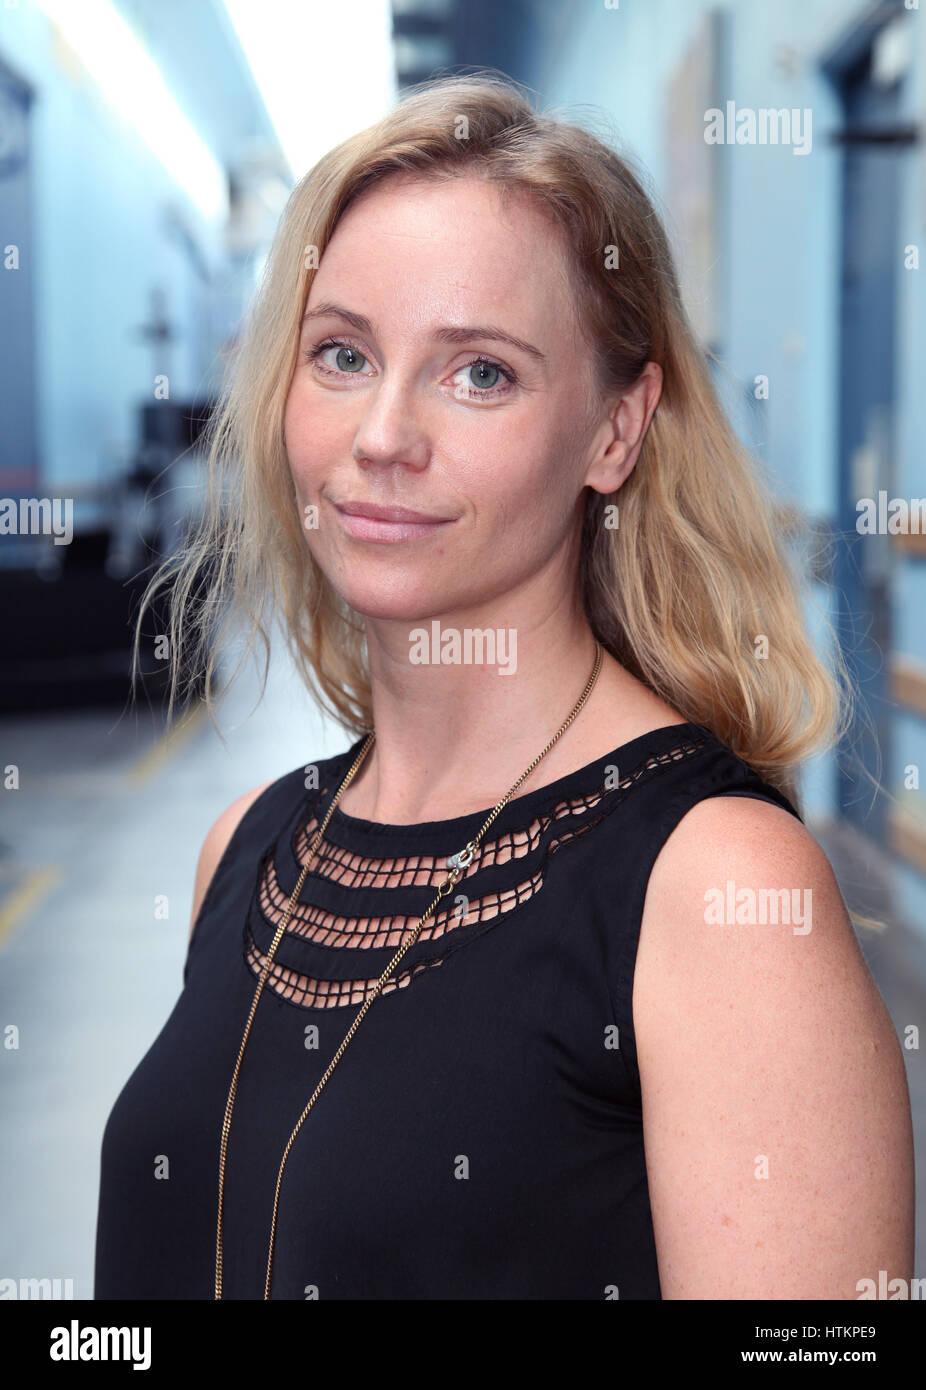 SOFIA HELIN Swedish actress in Television Swedish/Danish co productionTV series The Bridge as Police inspector Saga - Stock Image